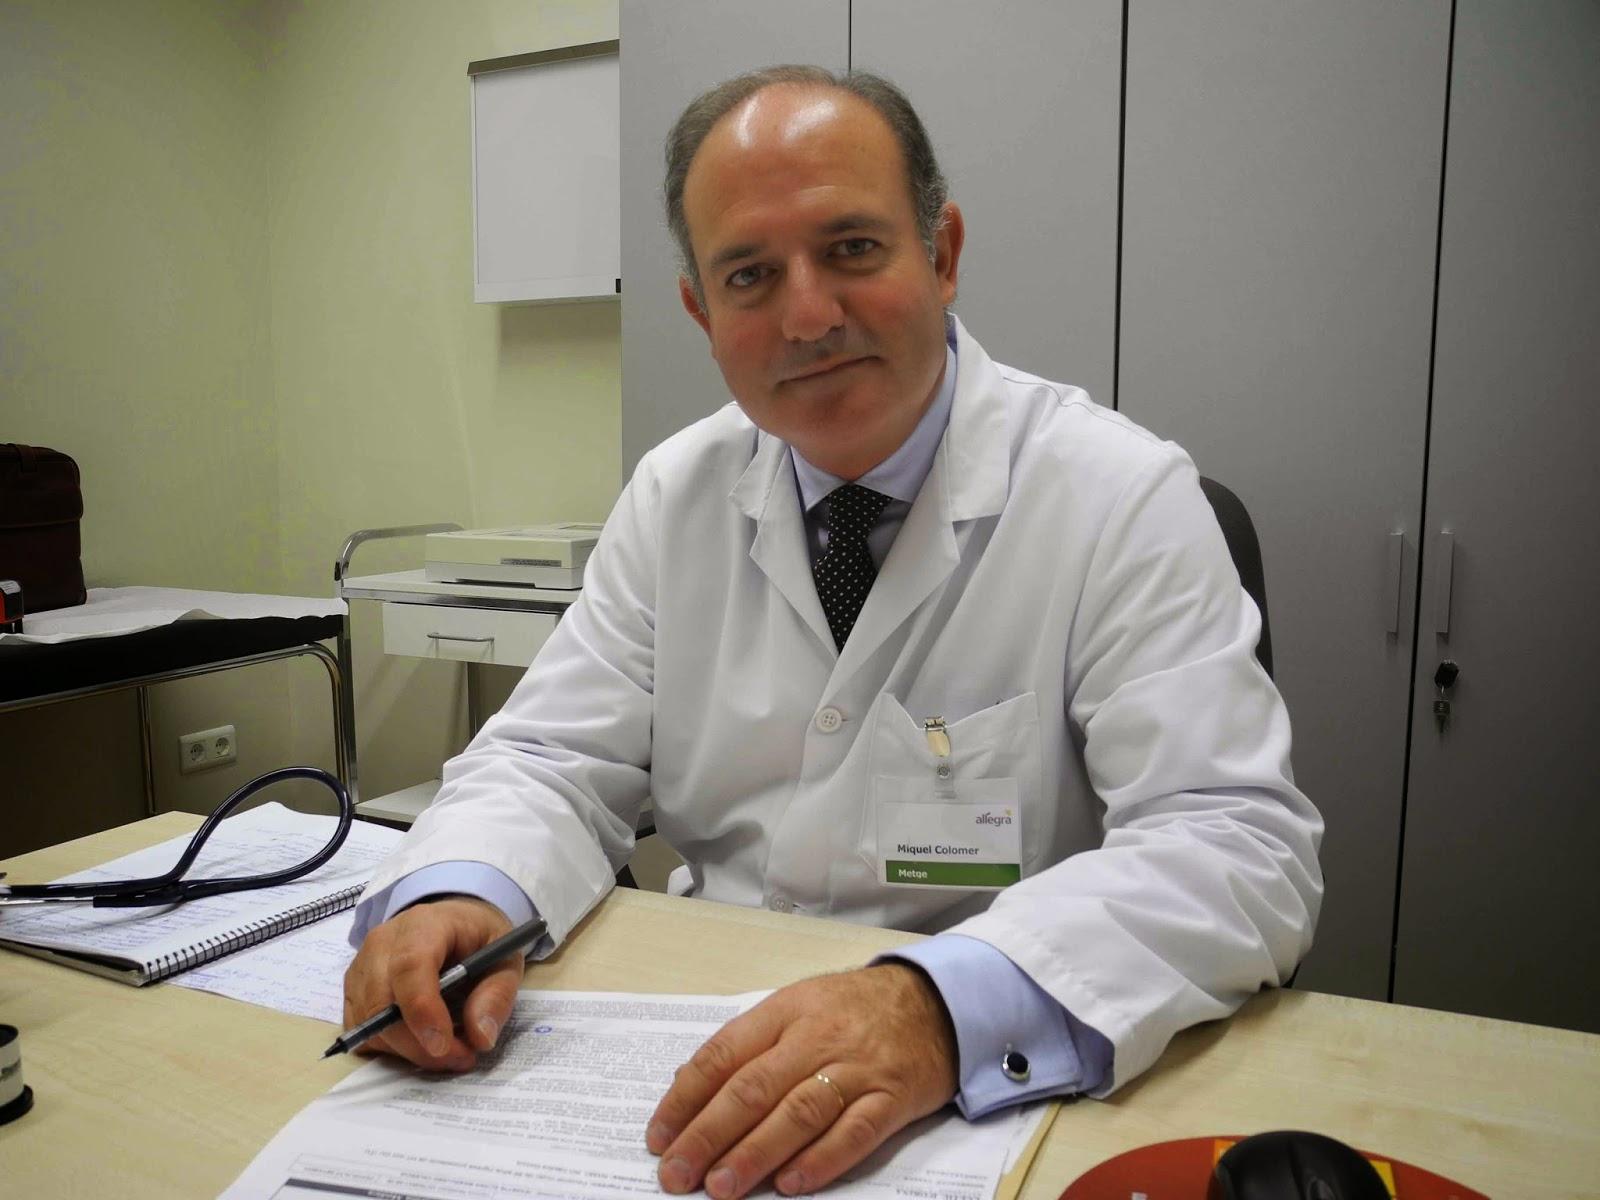 Doctor Colormer metge geriatra Sabadell. Residencia Allegra